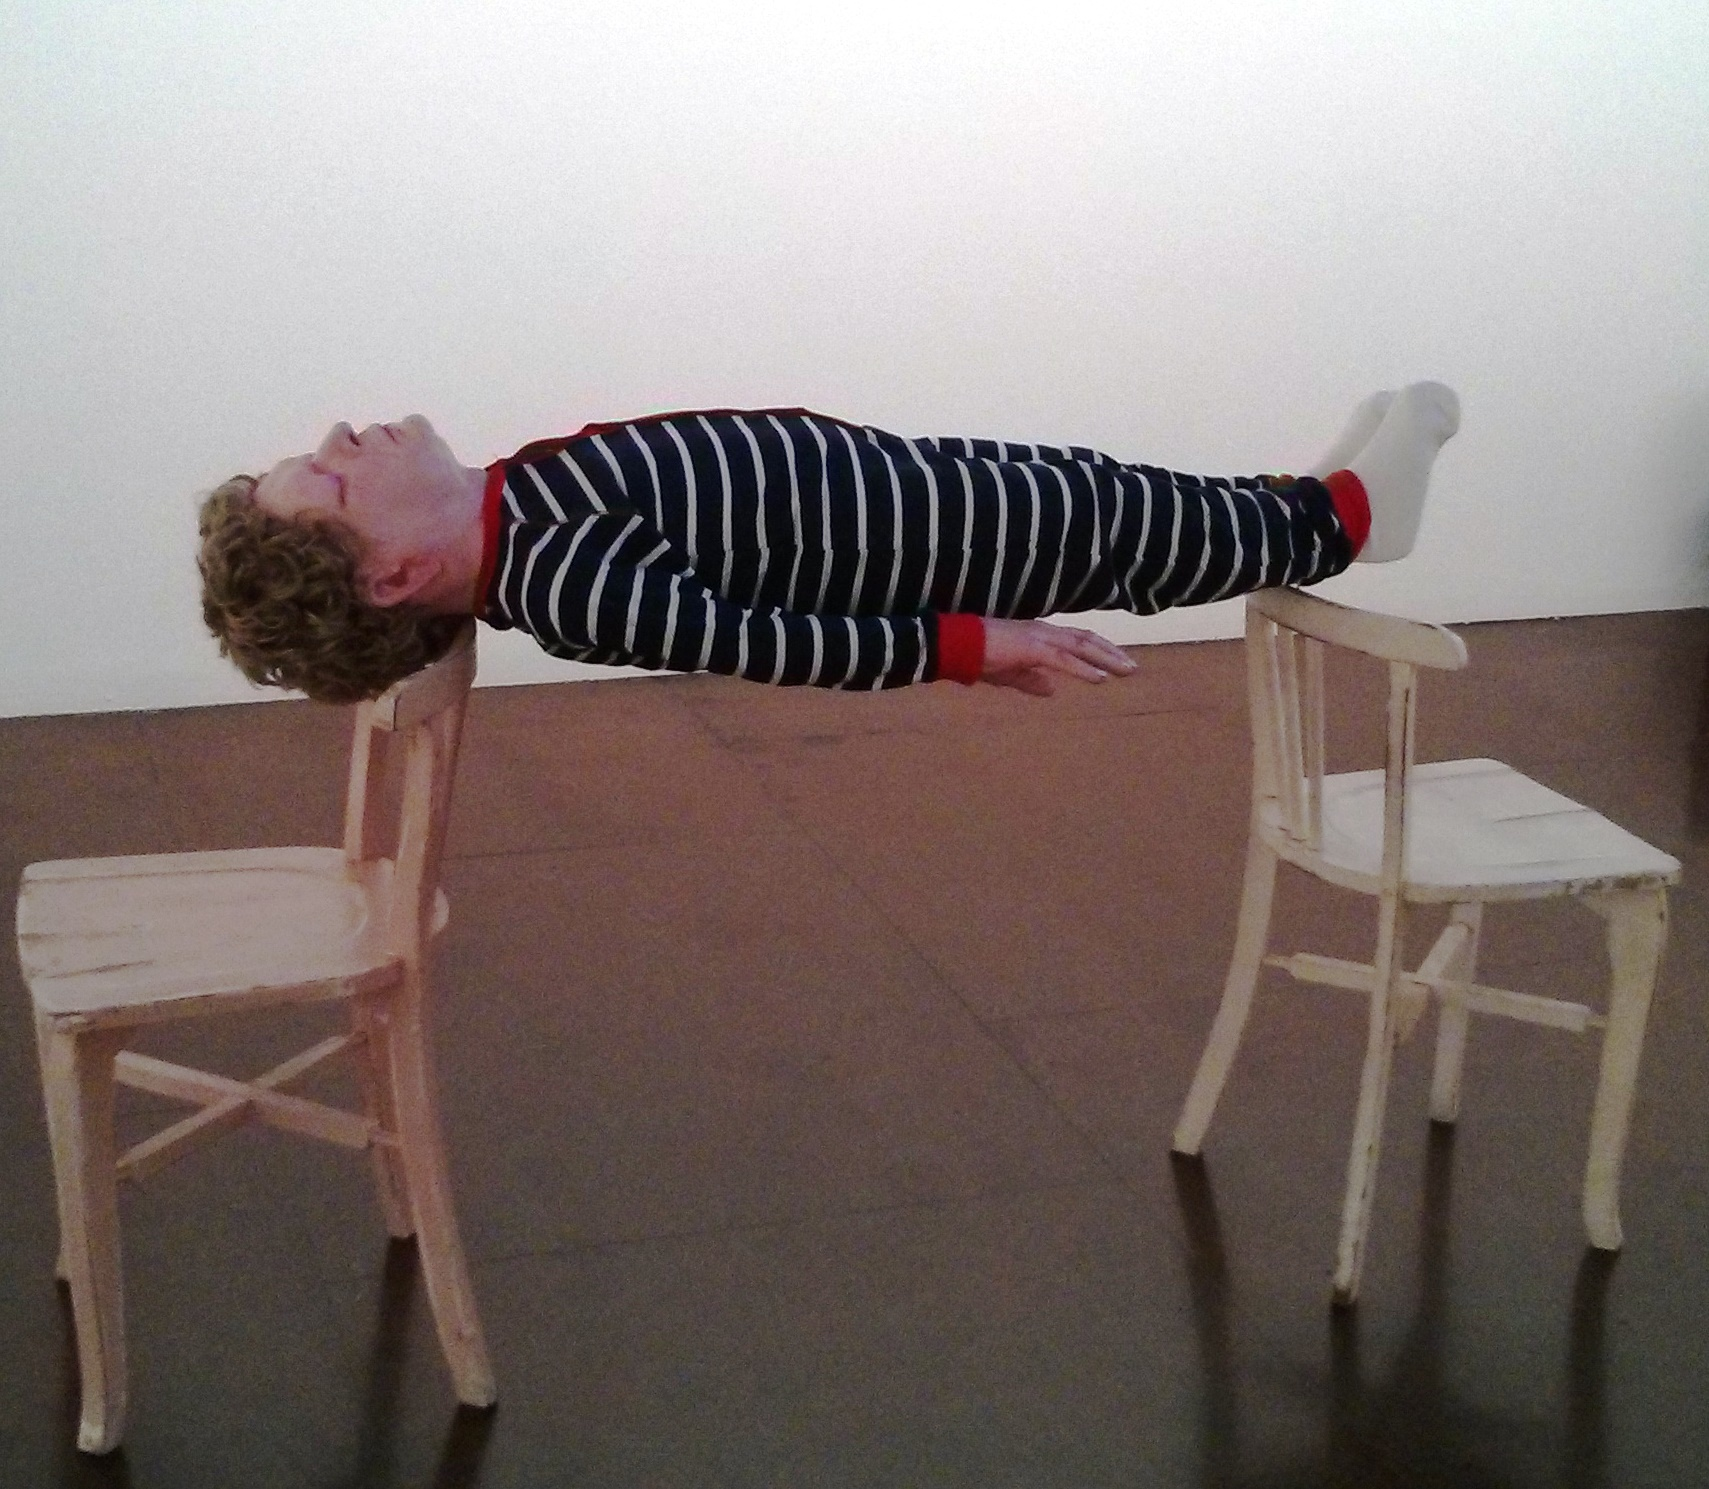 Ronnie van Hout, 'Dave' 2014, installation view, Darren Knight Gallery, Sydney. Photograph: Chloé Wolifson